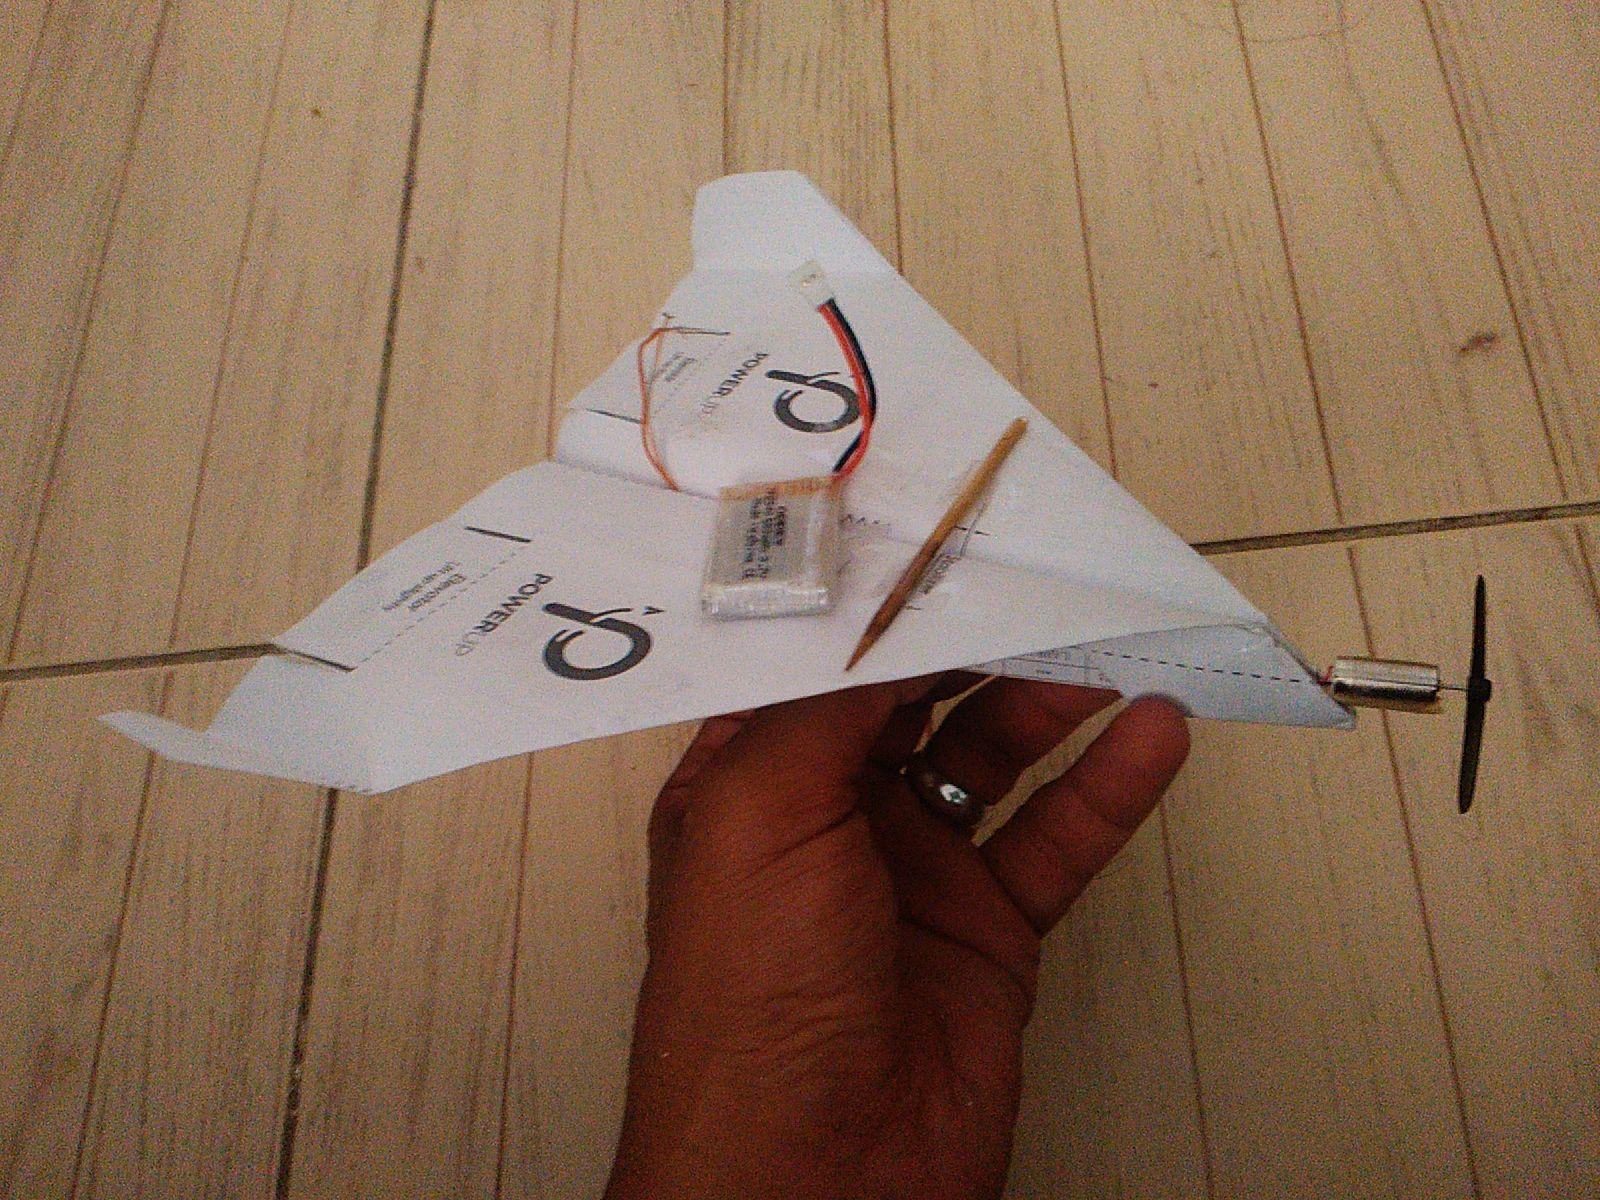 DIY Balsa Airplane Instructions | Balsa plane, Paper airplanes ... | 1200x1600